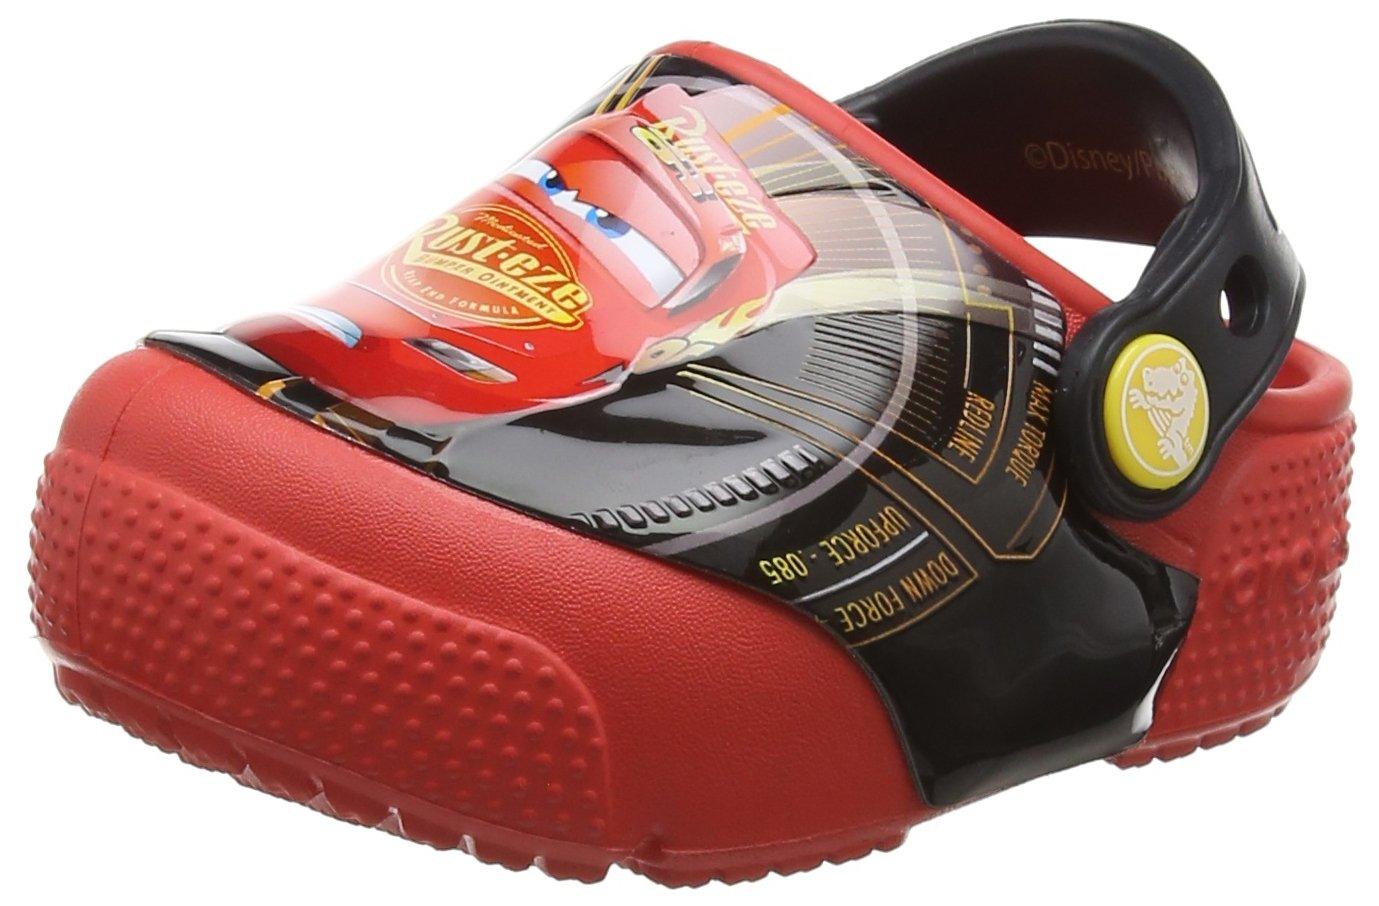 Crocs Kids' Crocsfunlab Lights Cars 3 Clog, Flame, 12 M US Little Kid